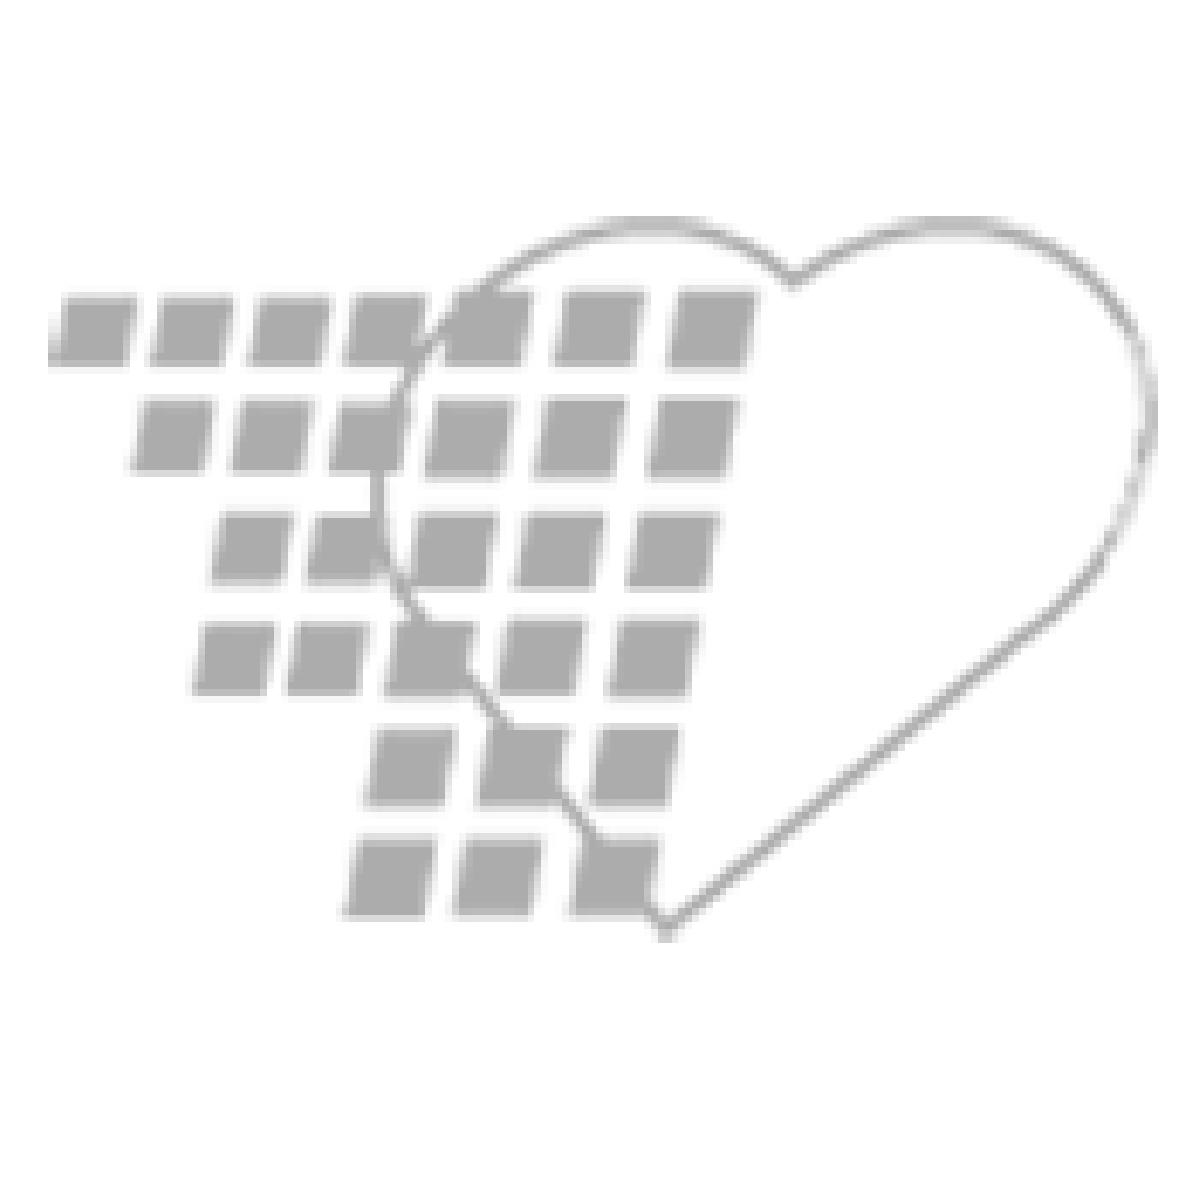 02 20 4215 Standard Bulb With Regular End Valve Replacement Pocket Nurse